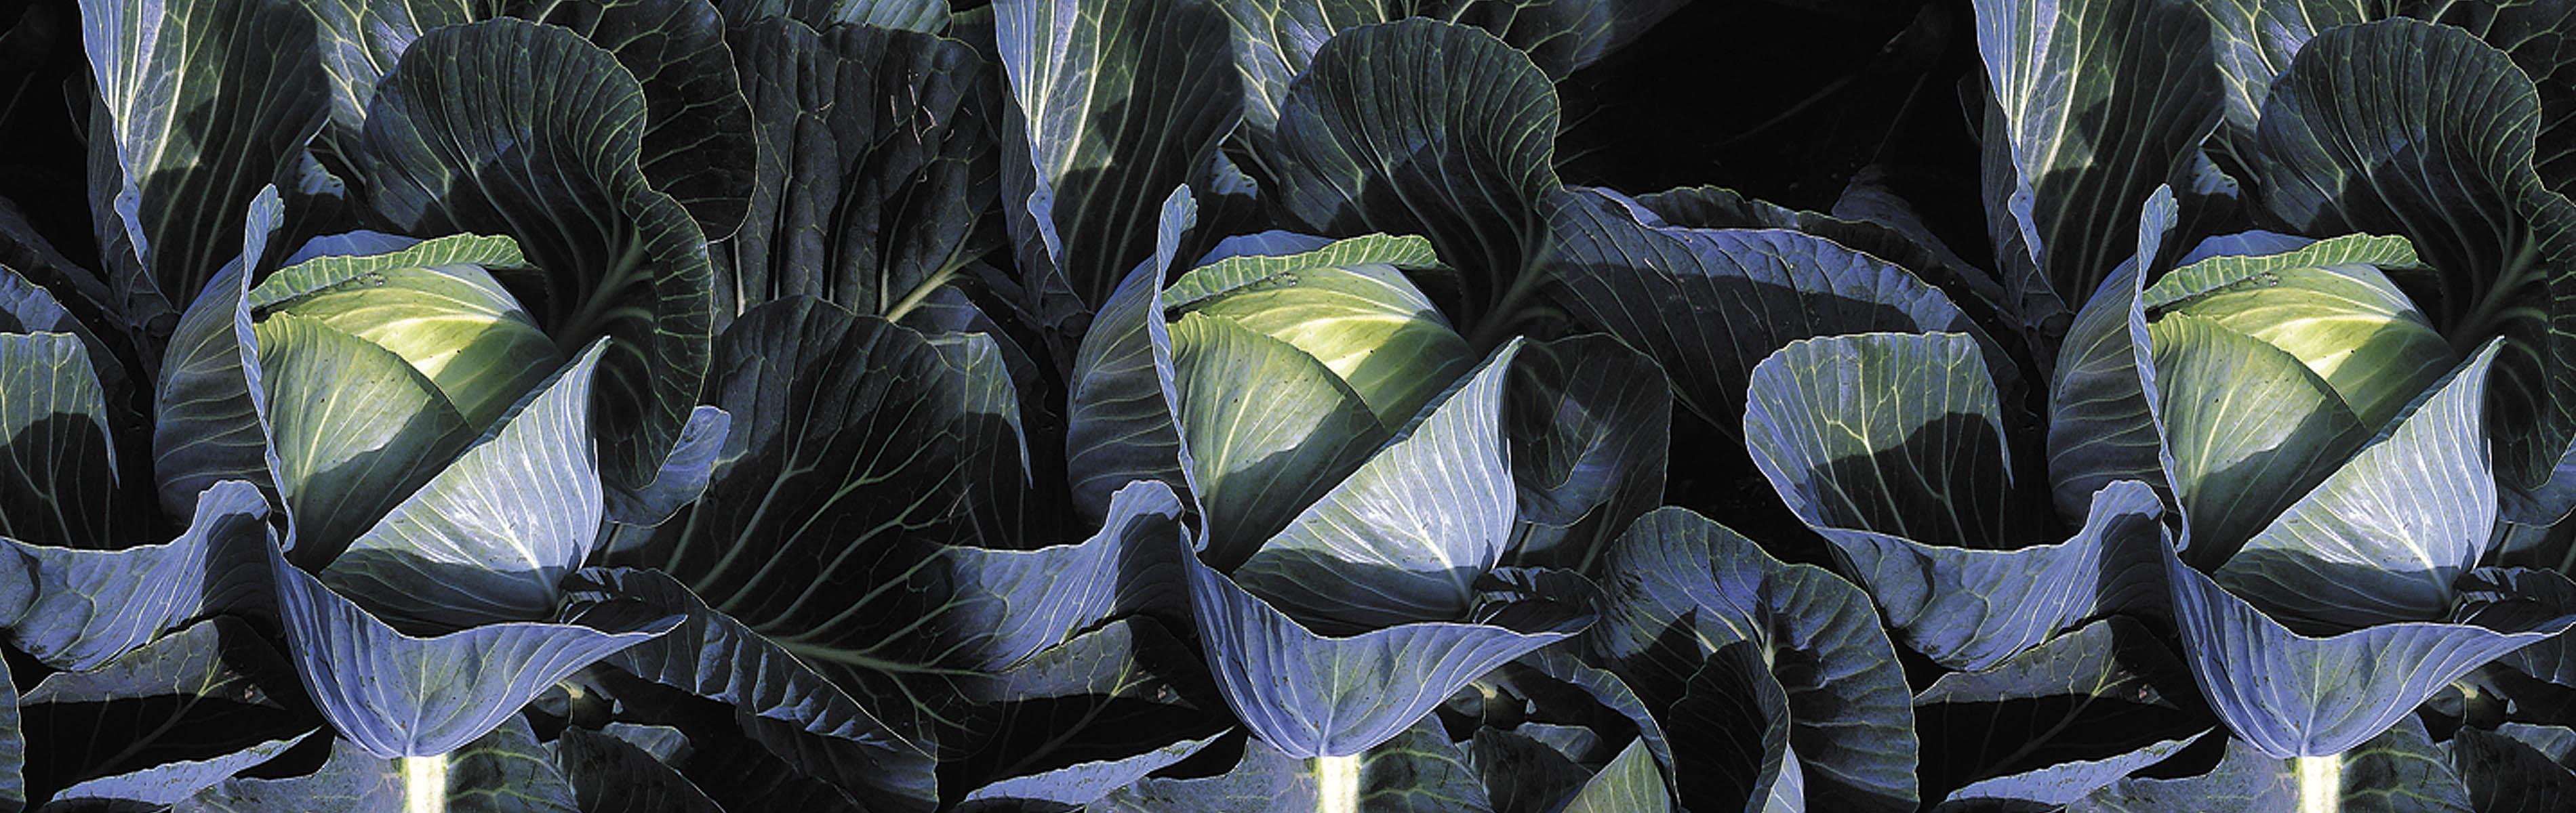 Cabbage Hybrids